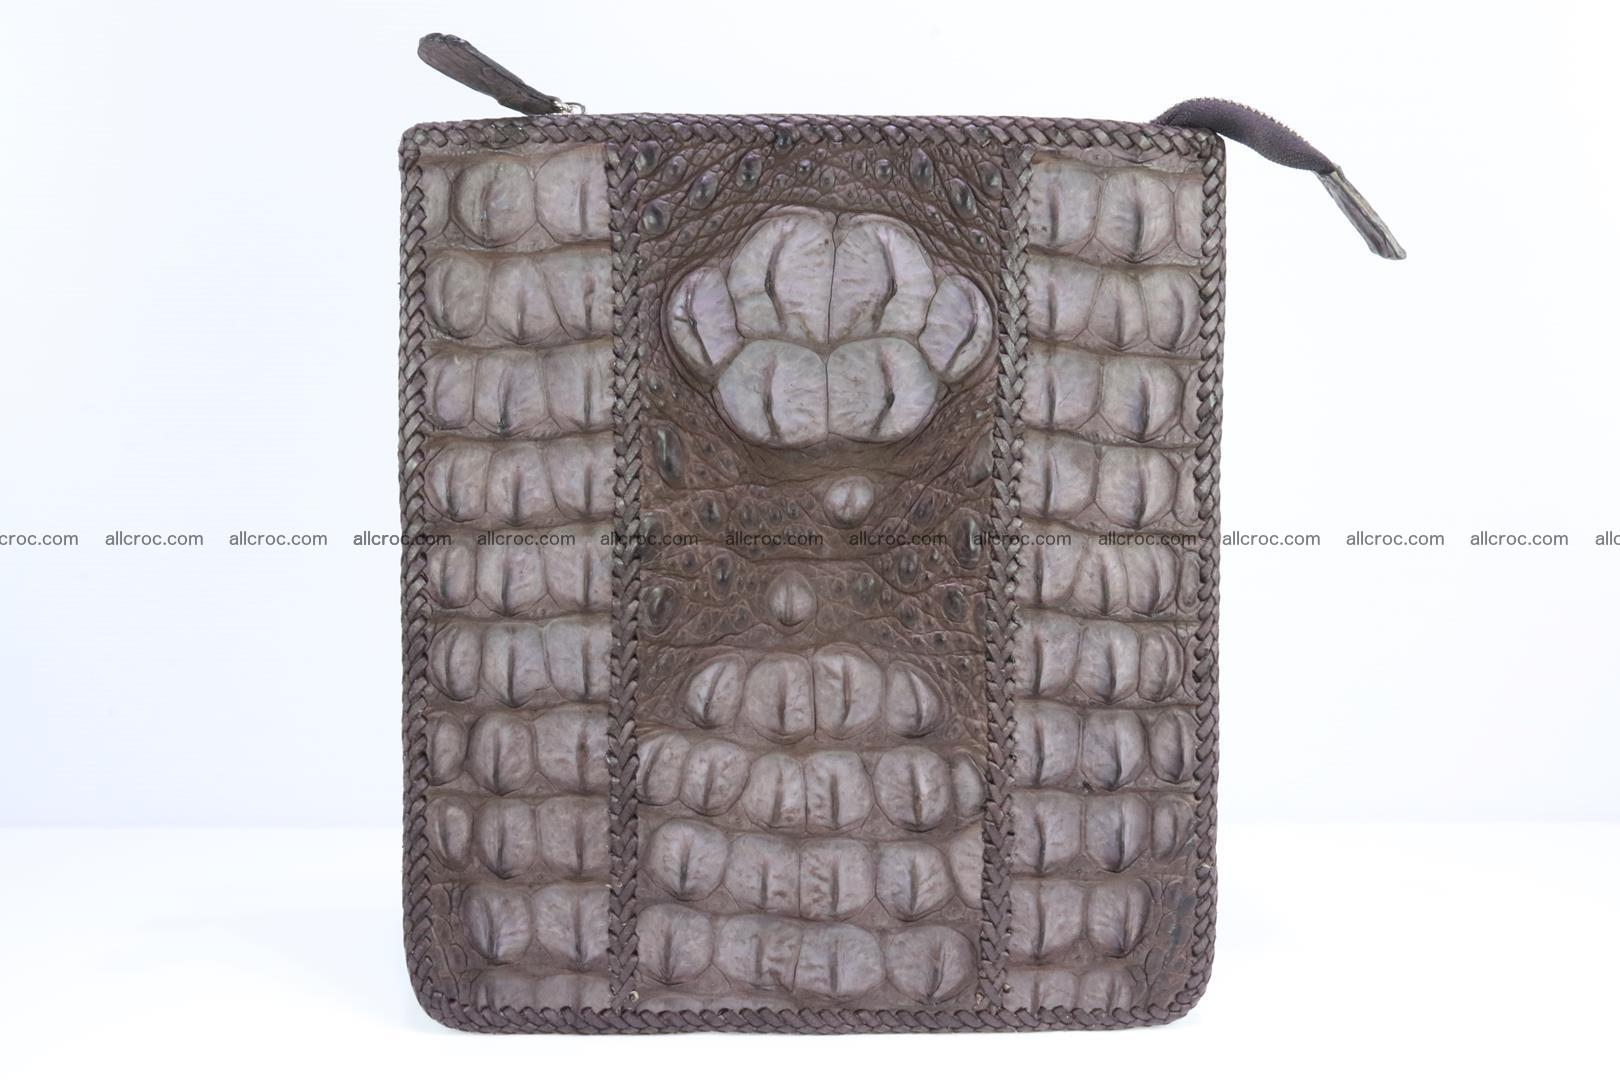 Crocodile skin shoulder bag hand braided edges 129 Foto 0